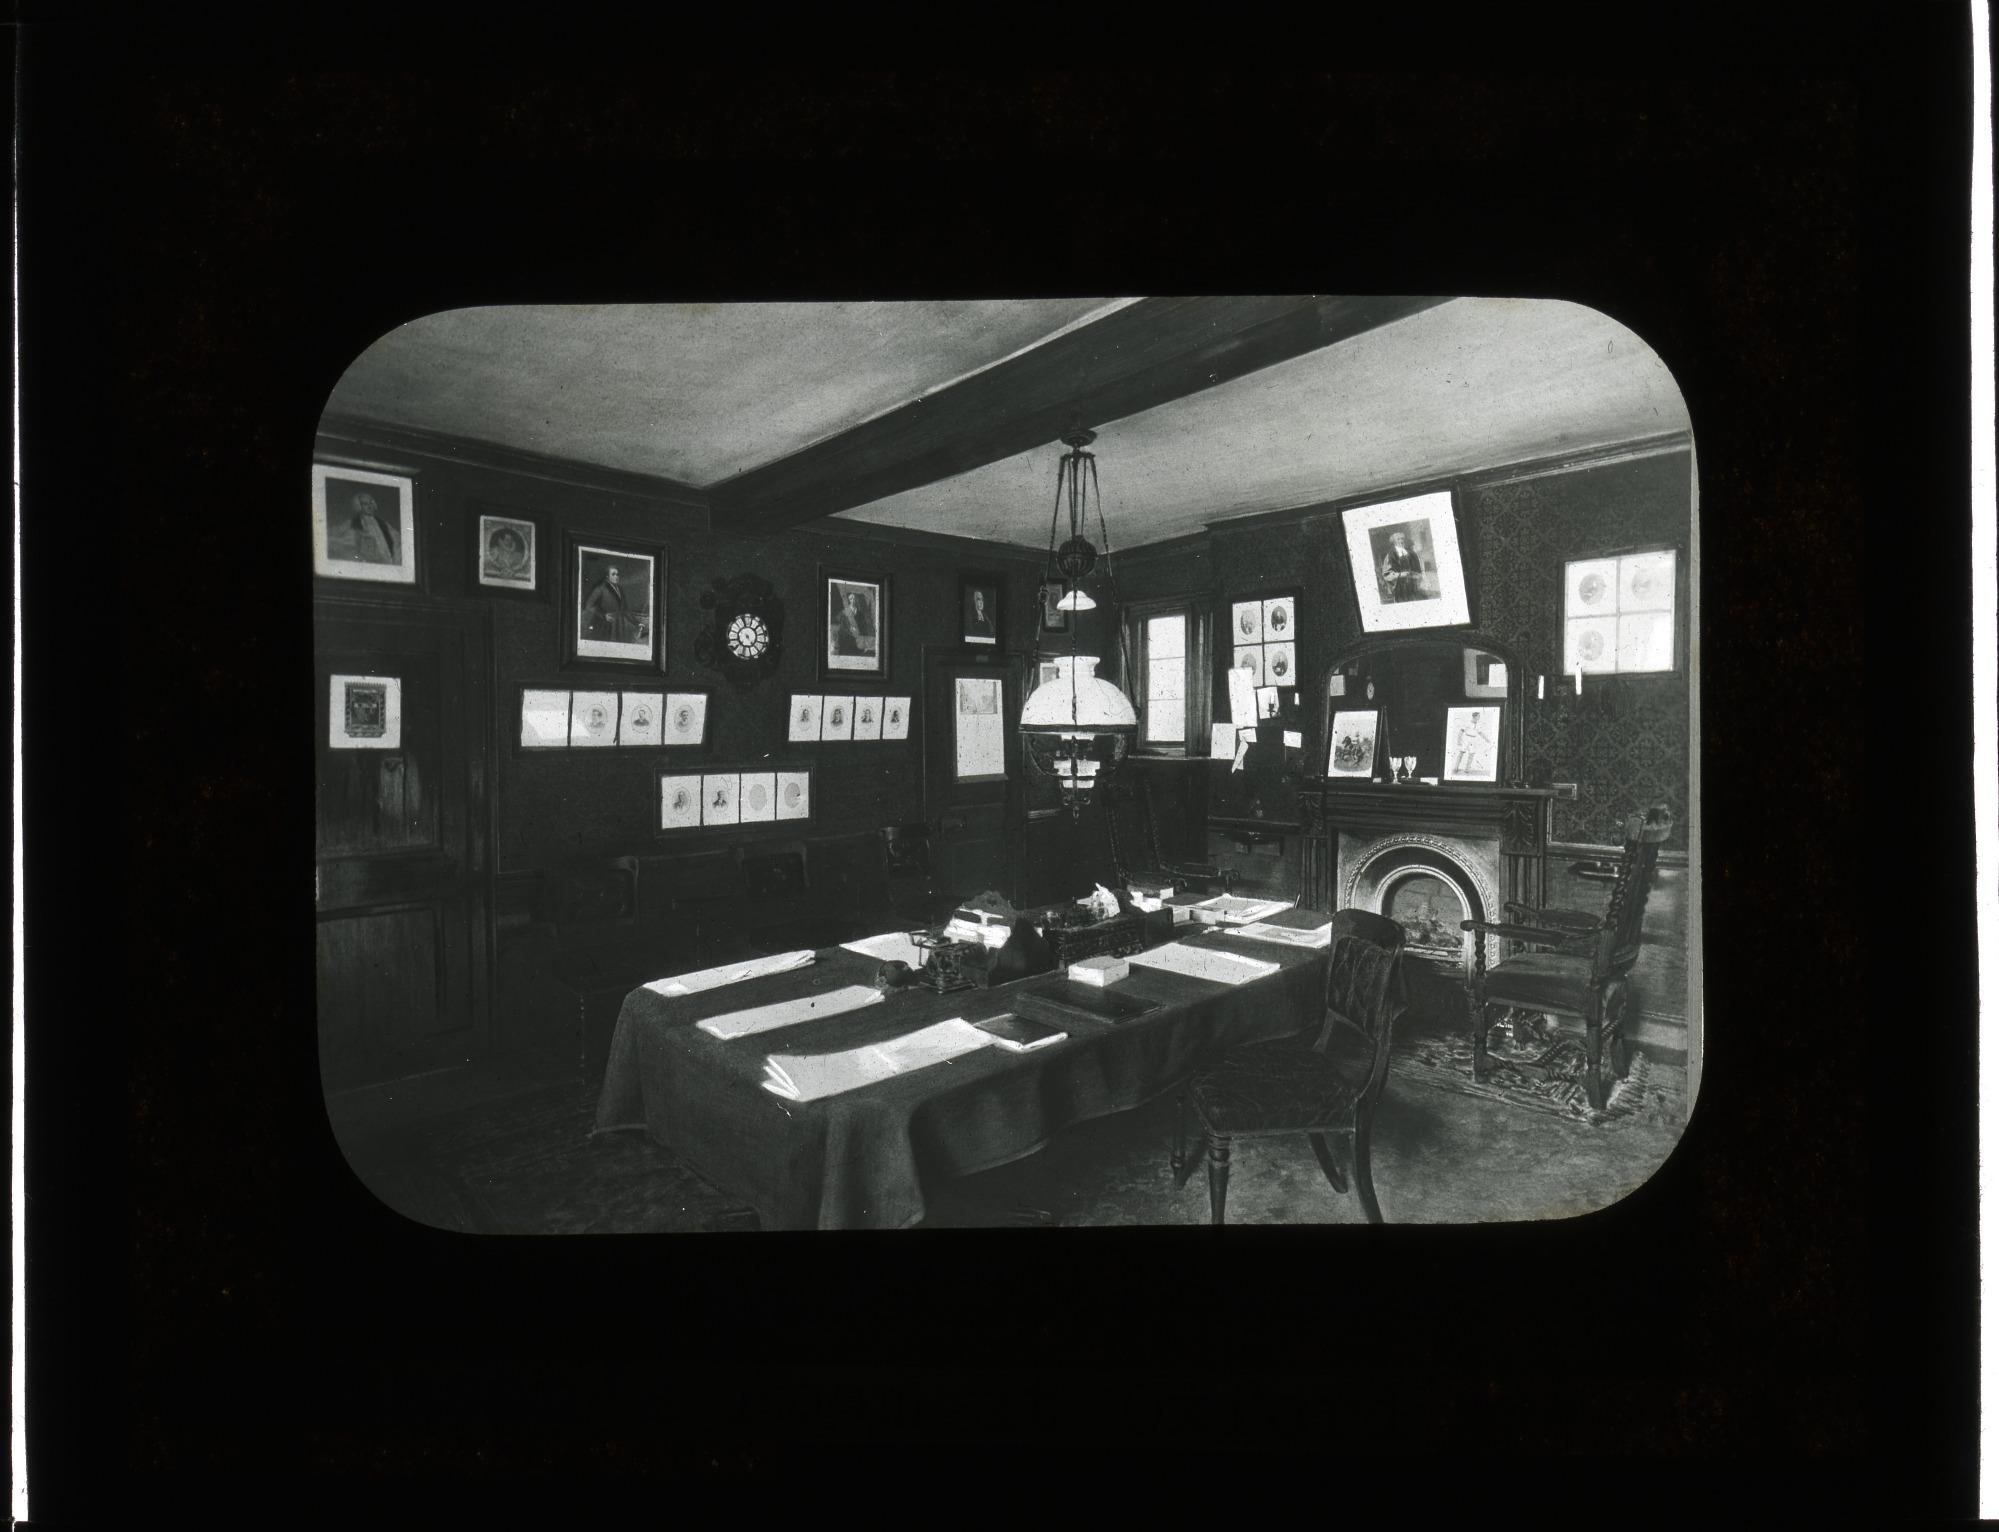 James Smithson's room at Pembroke College, Oxford College, 1894